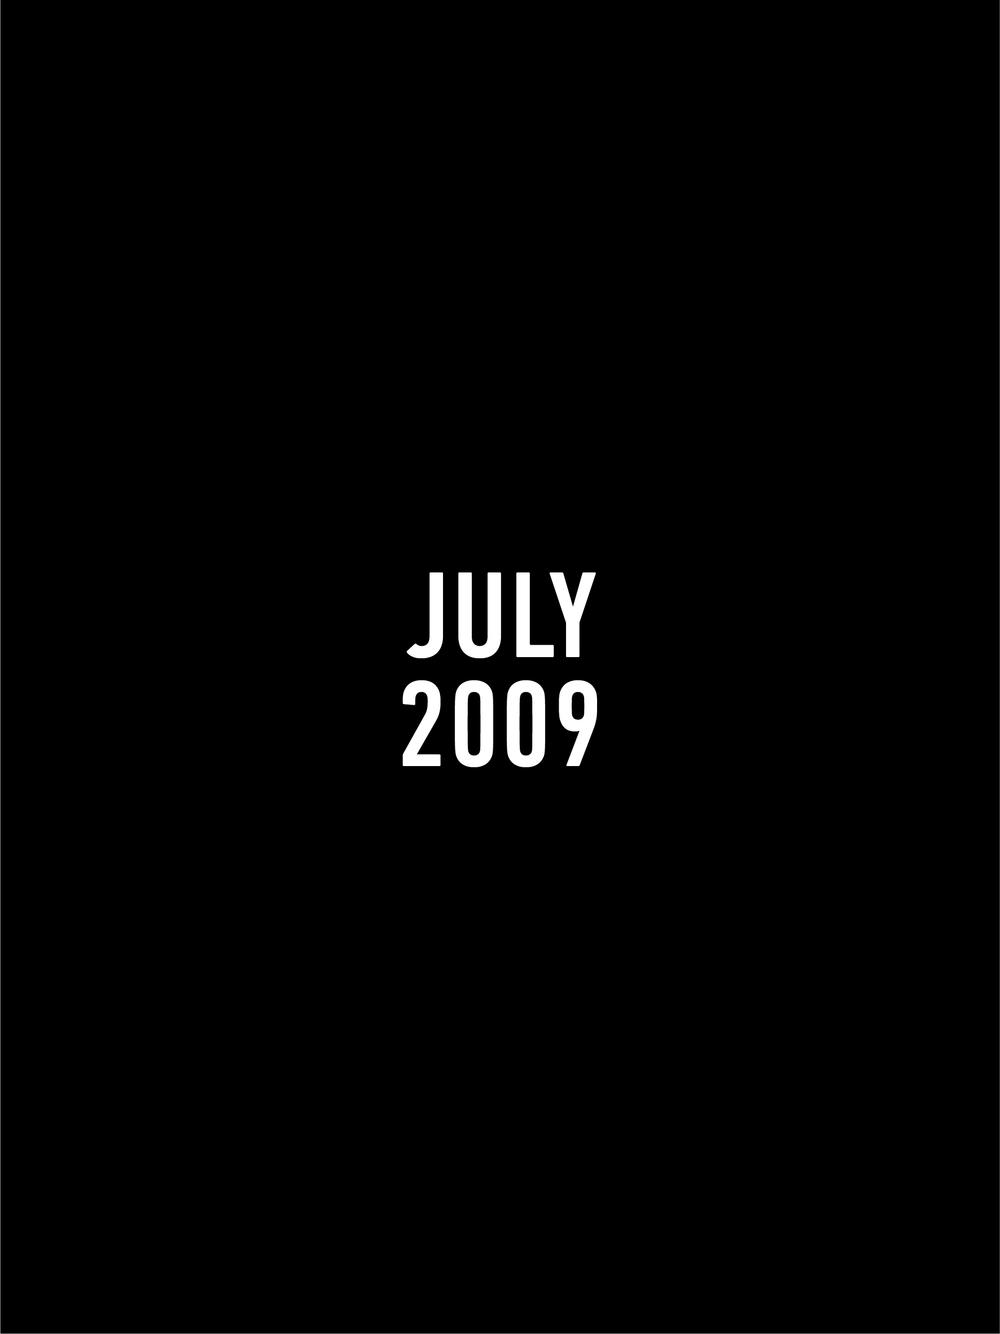 2009 monthly7.jpg